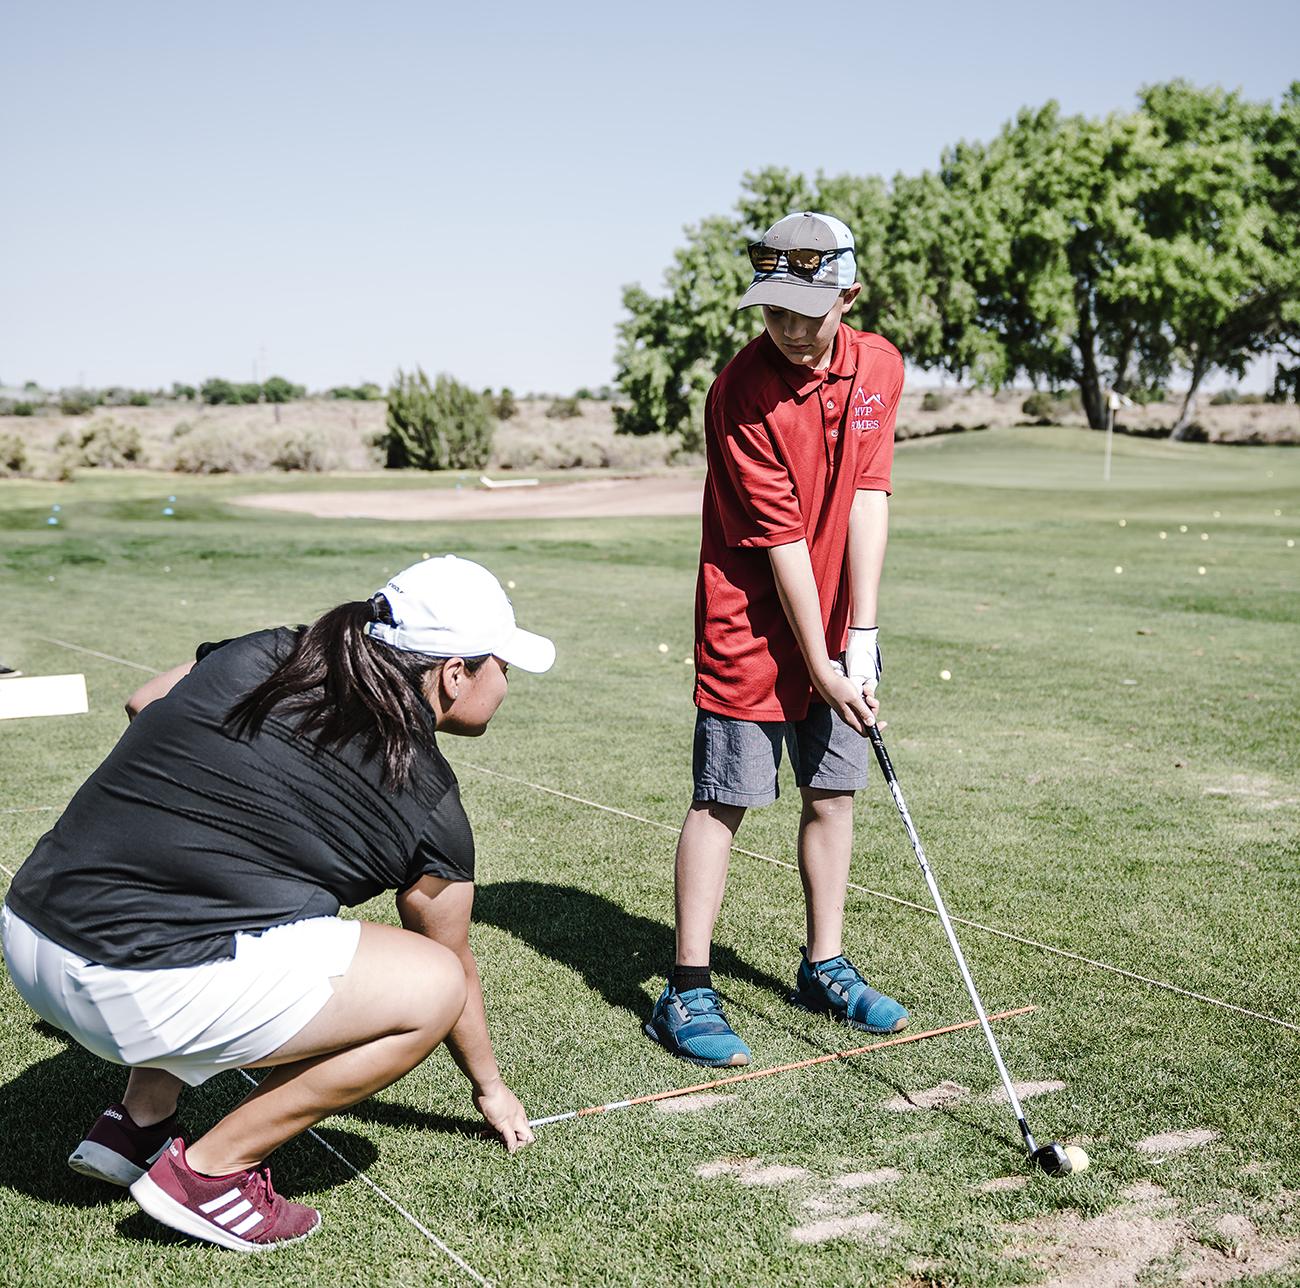 Victory_Golfworks_Virtual_Golf_Professional_Training_Year_Round_Golf_Cache_County_Utah_19